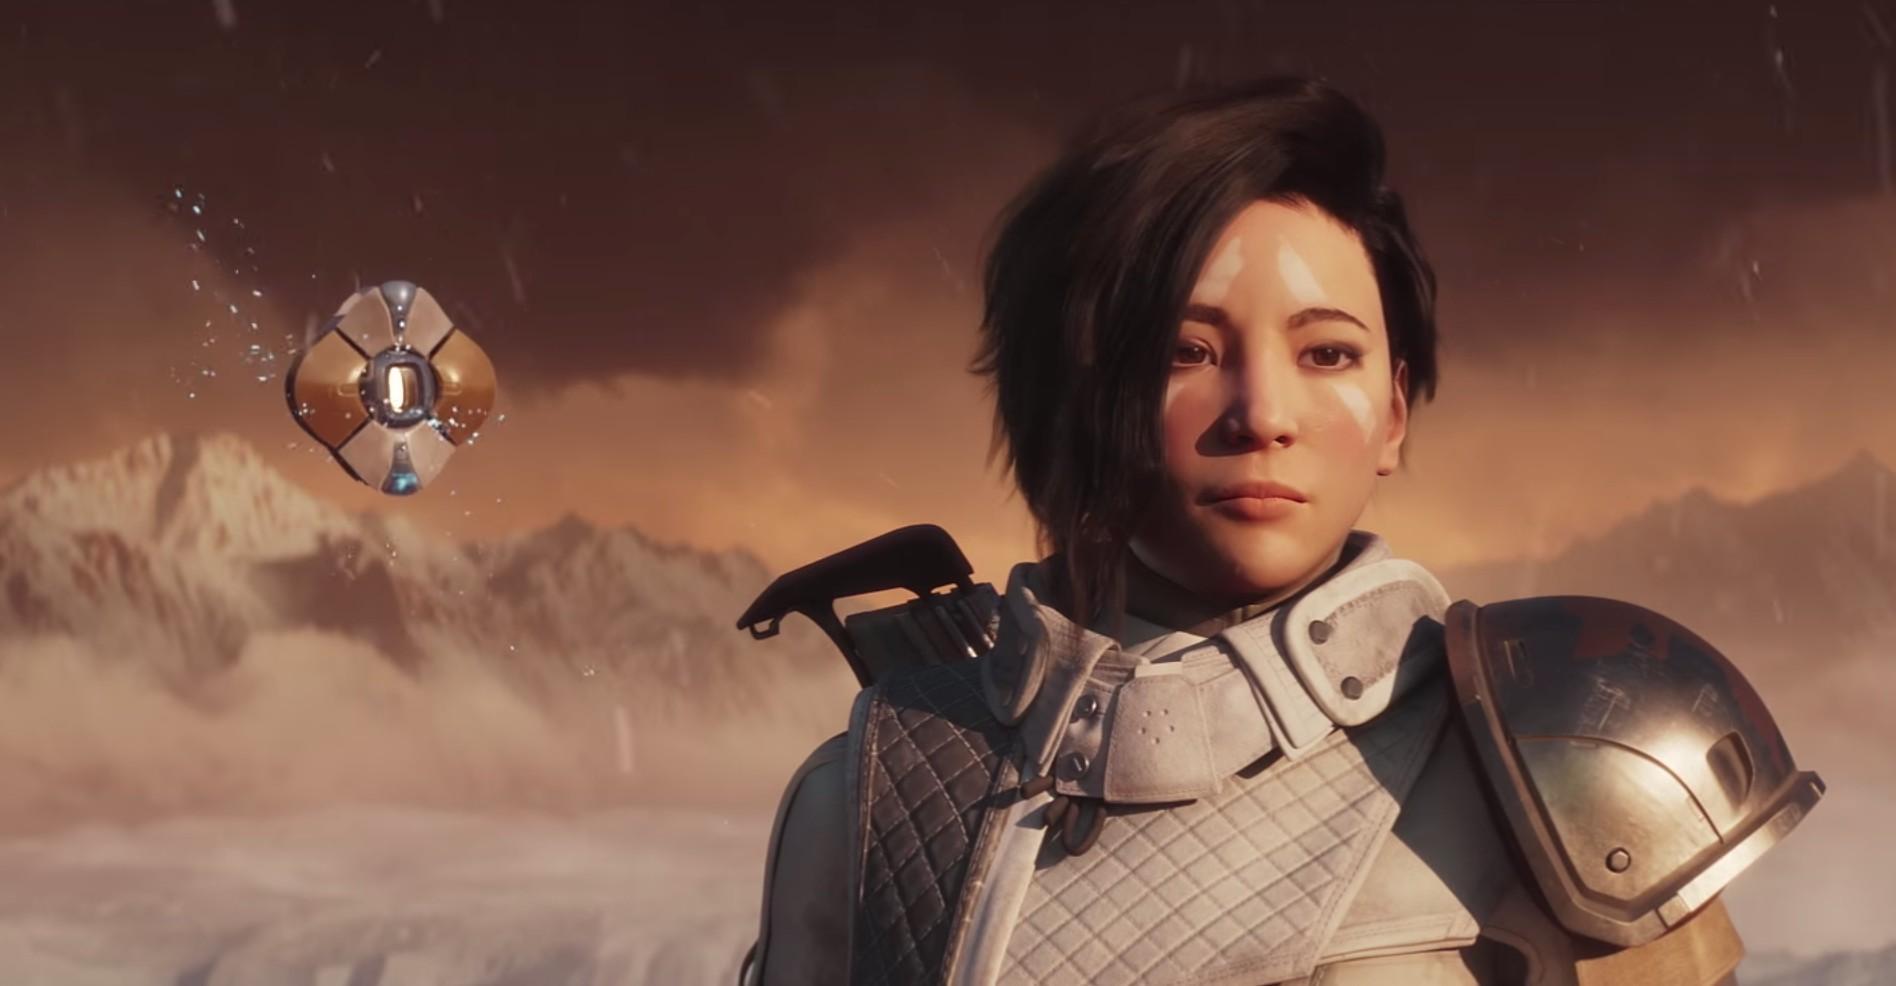 Destiny 2 honors fallen developer Matt Helsom in new quest